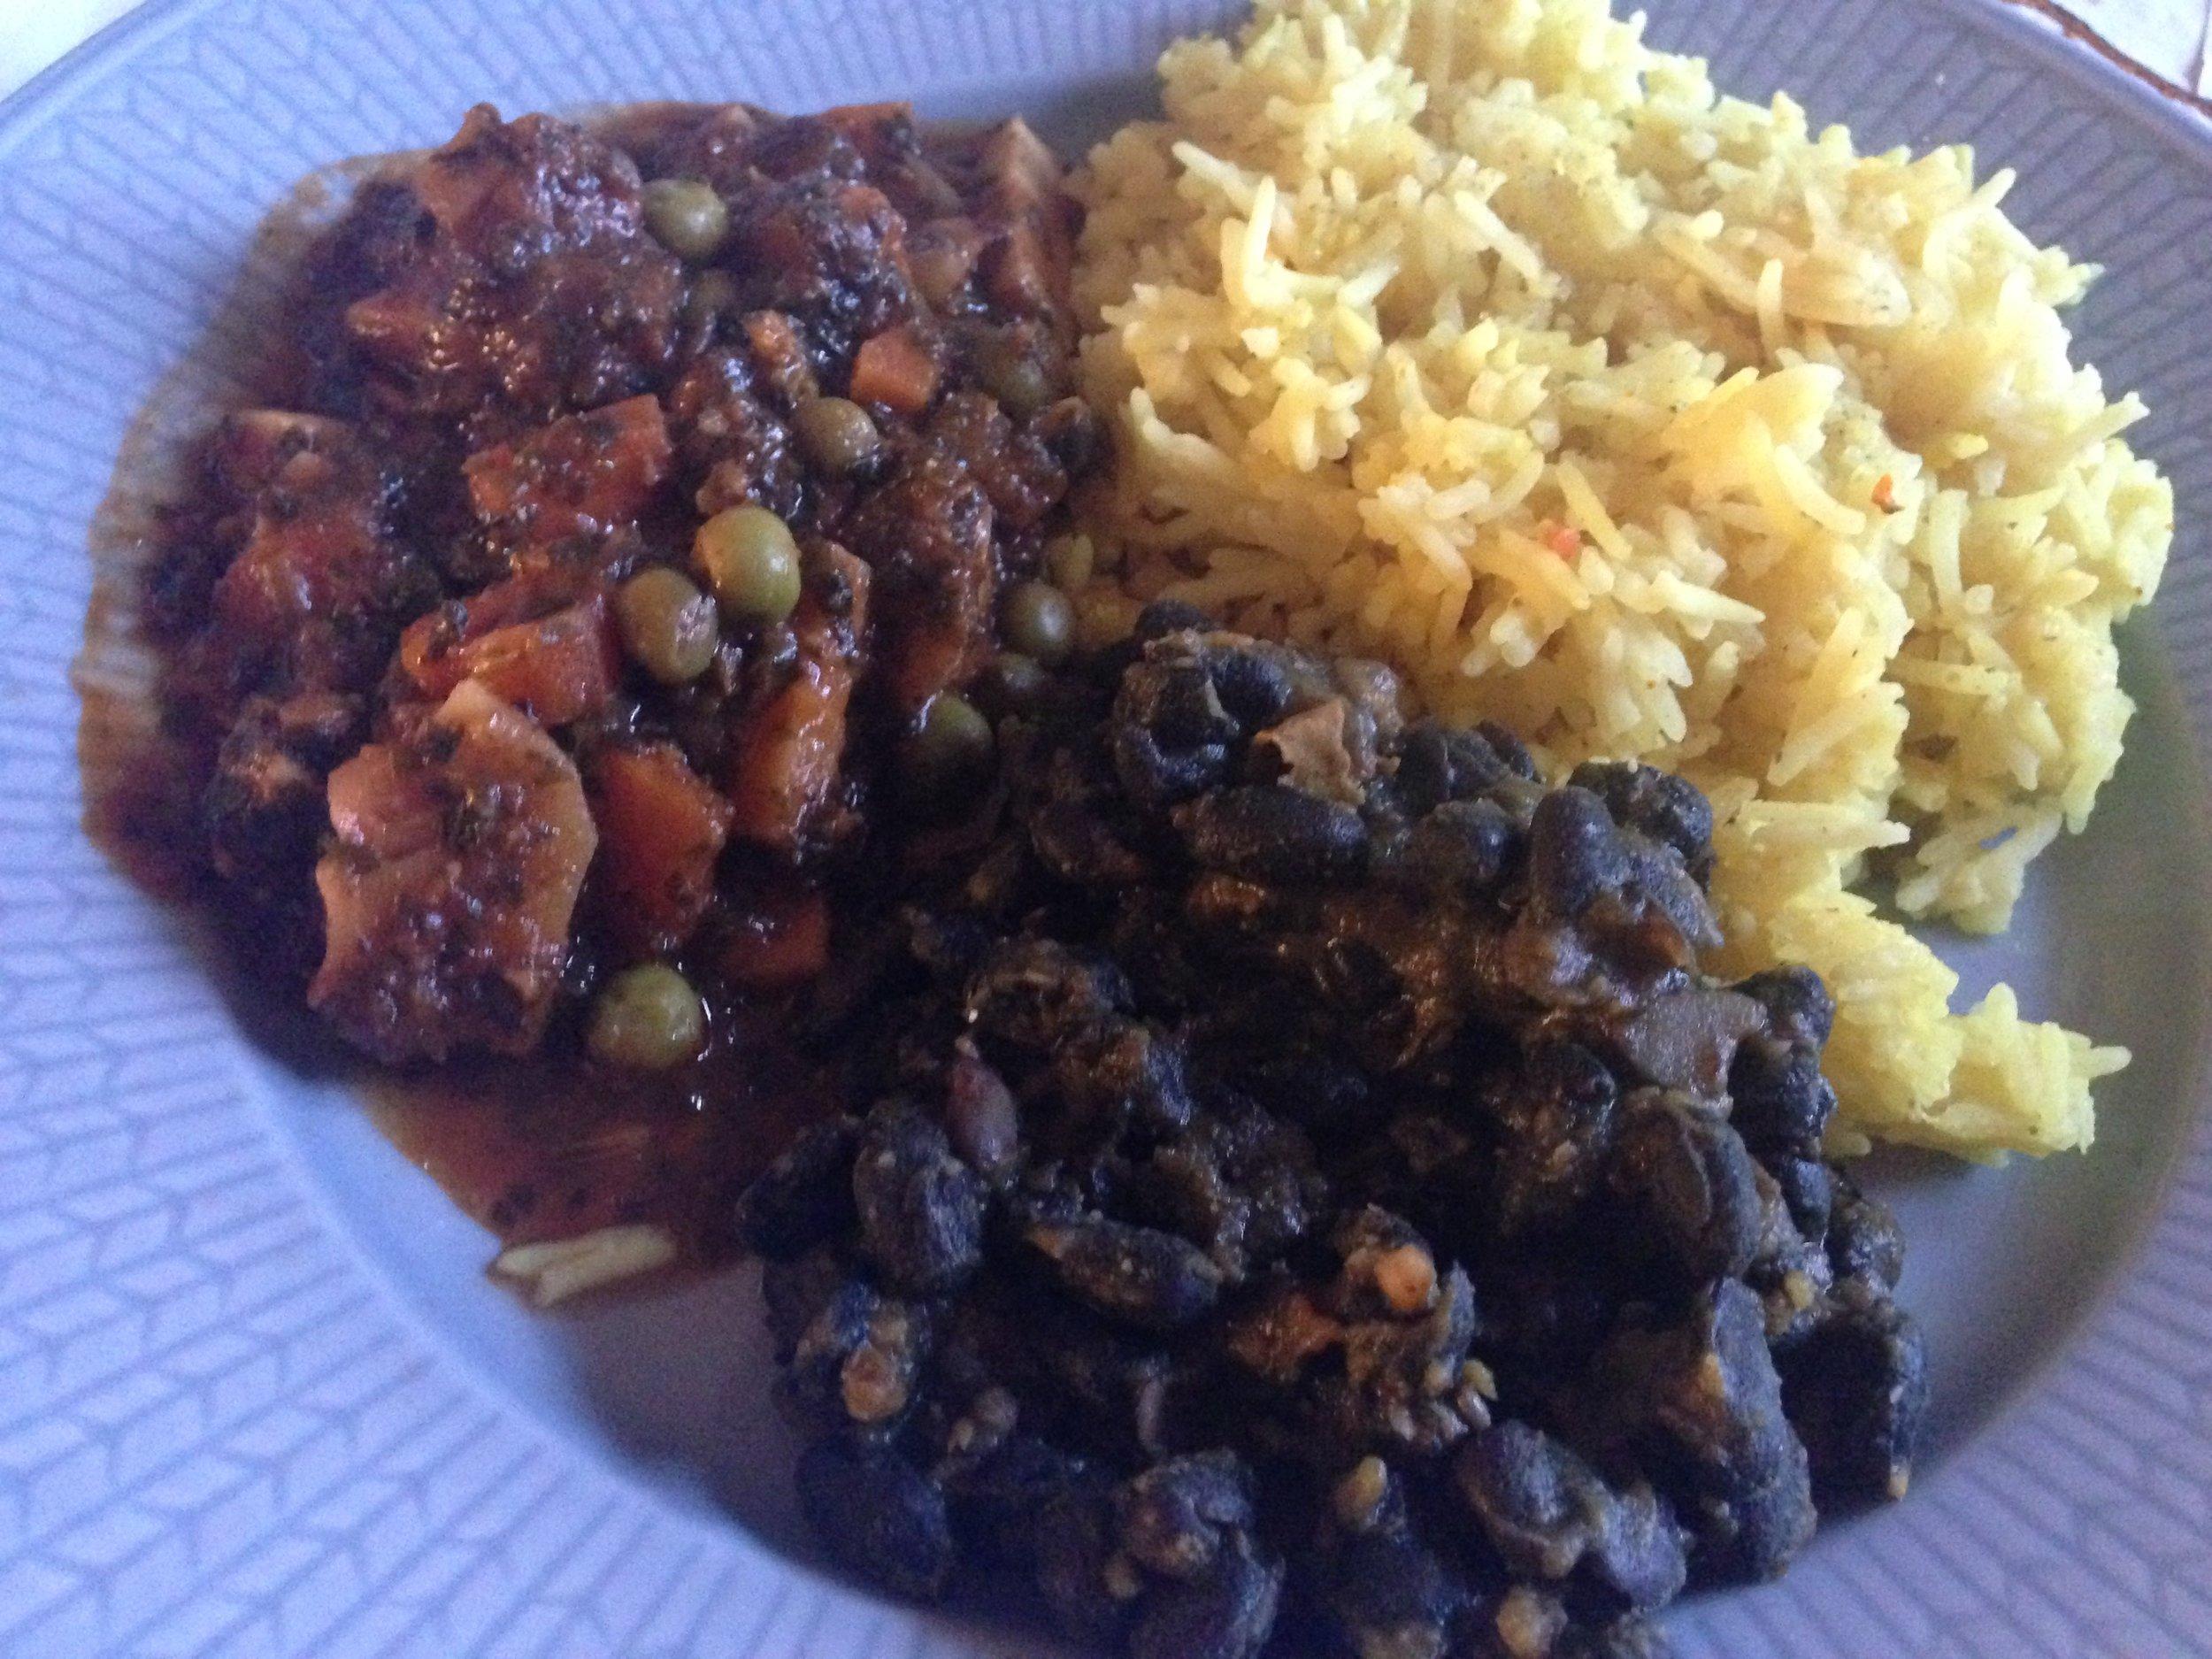 Casado: Bönor & Ris serverat med ratatouille